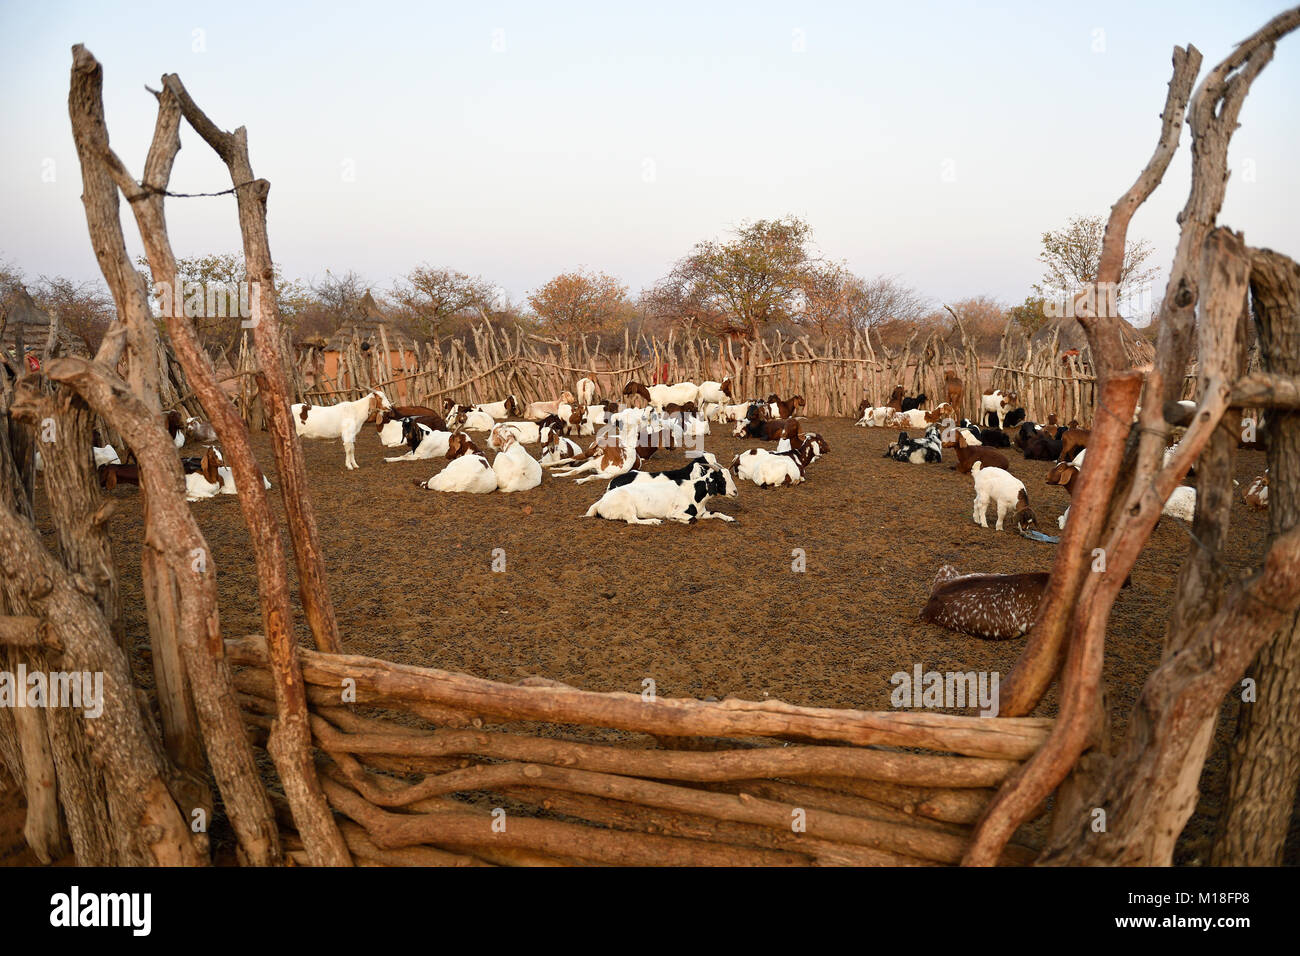 Goats in the Kral,Himba village,Kunene,Kaokoveld,Namibia - Stock Image